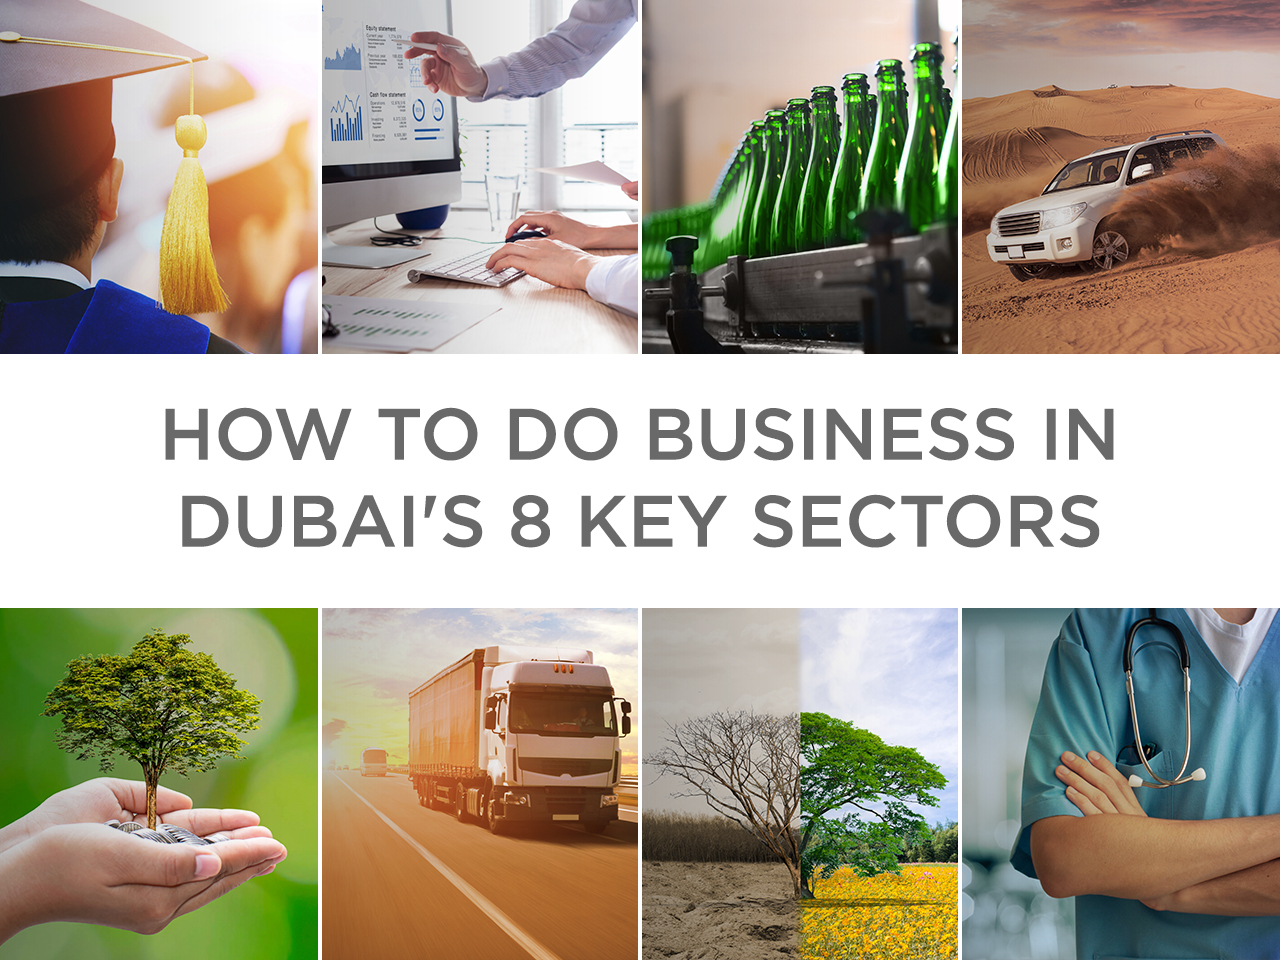 Virtuzone and Dubai Startup Hub launch 8 guides on business setup